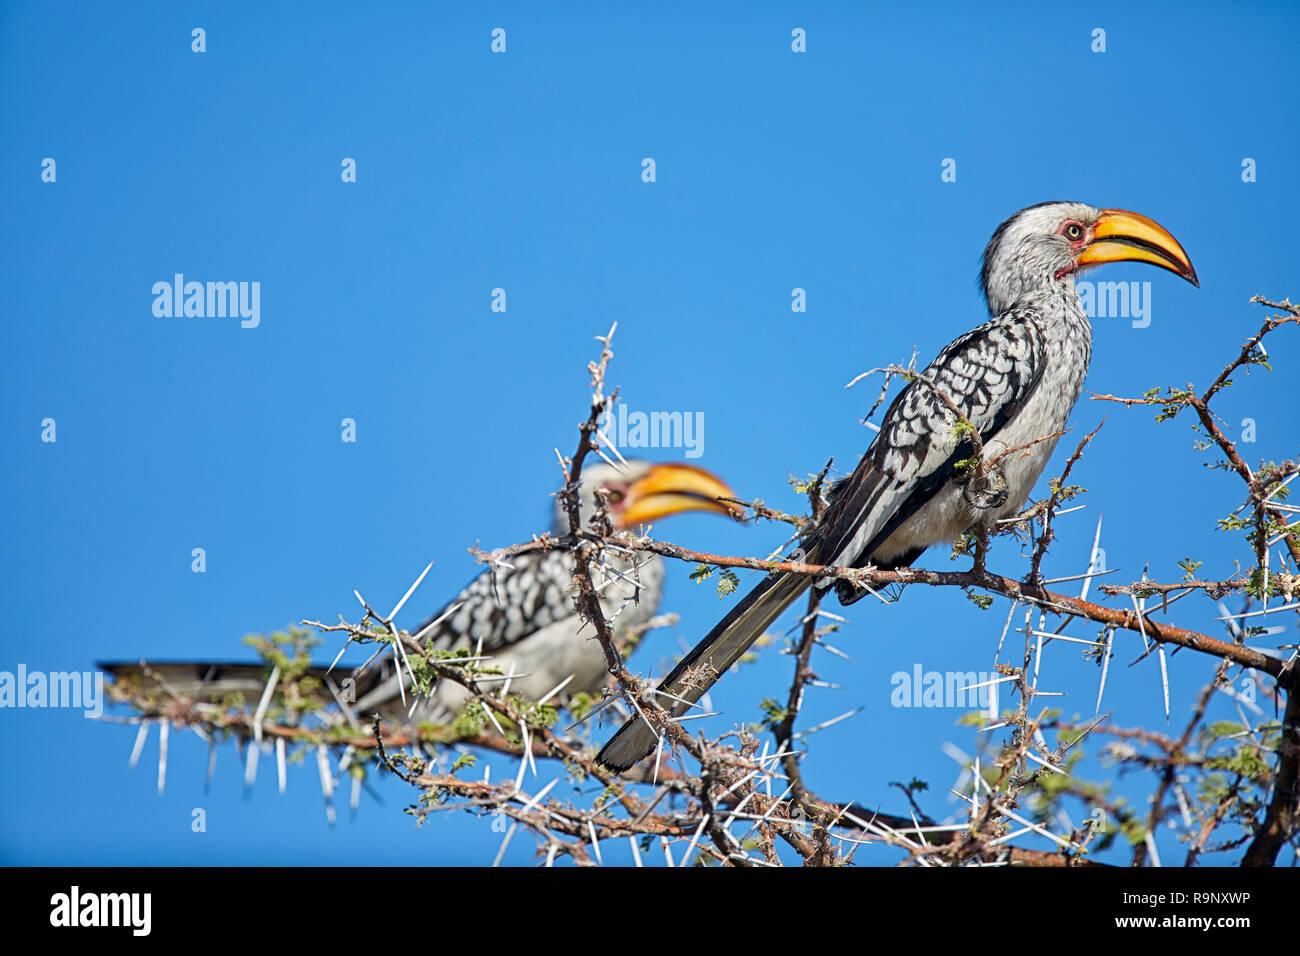 Tockus Leucomelas Southern Yellow Billed Hornbill Etosha National Park Namibia, Africa - Stock Image